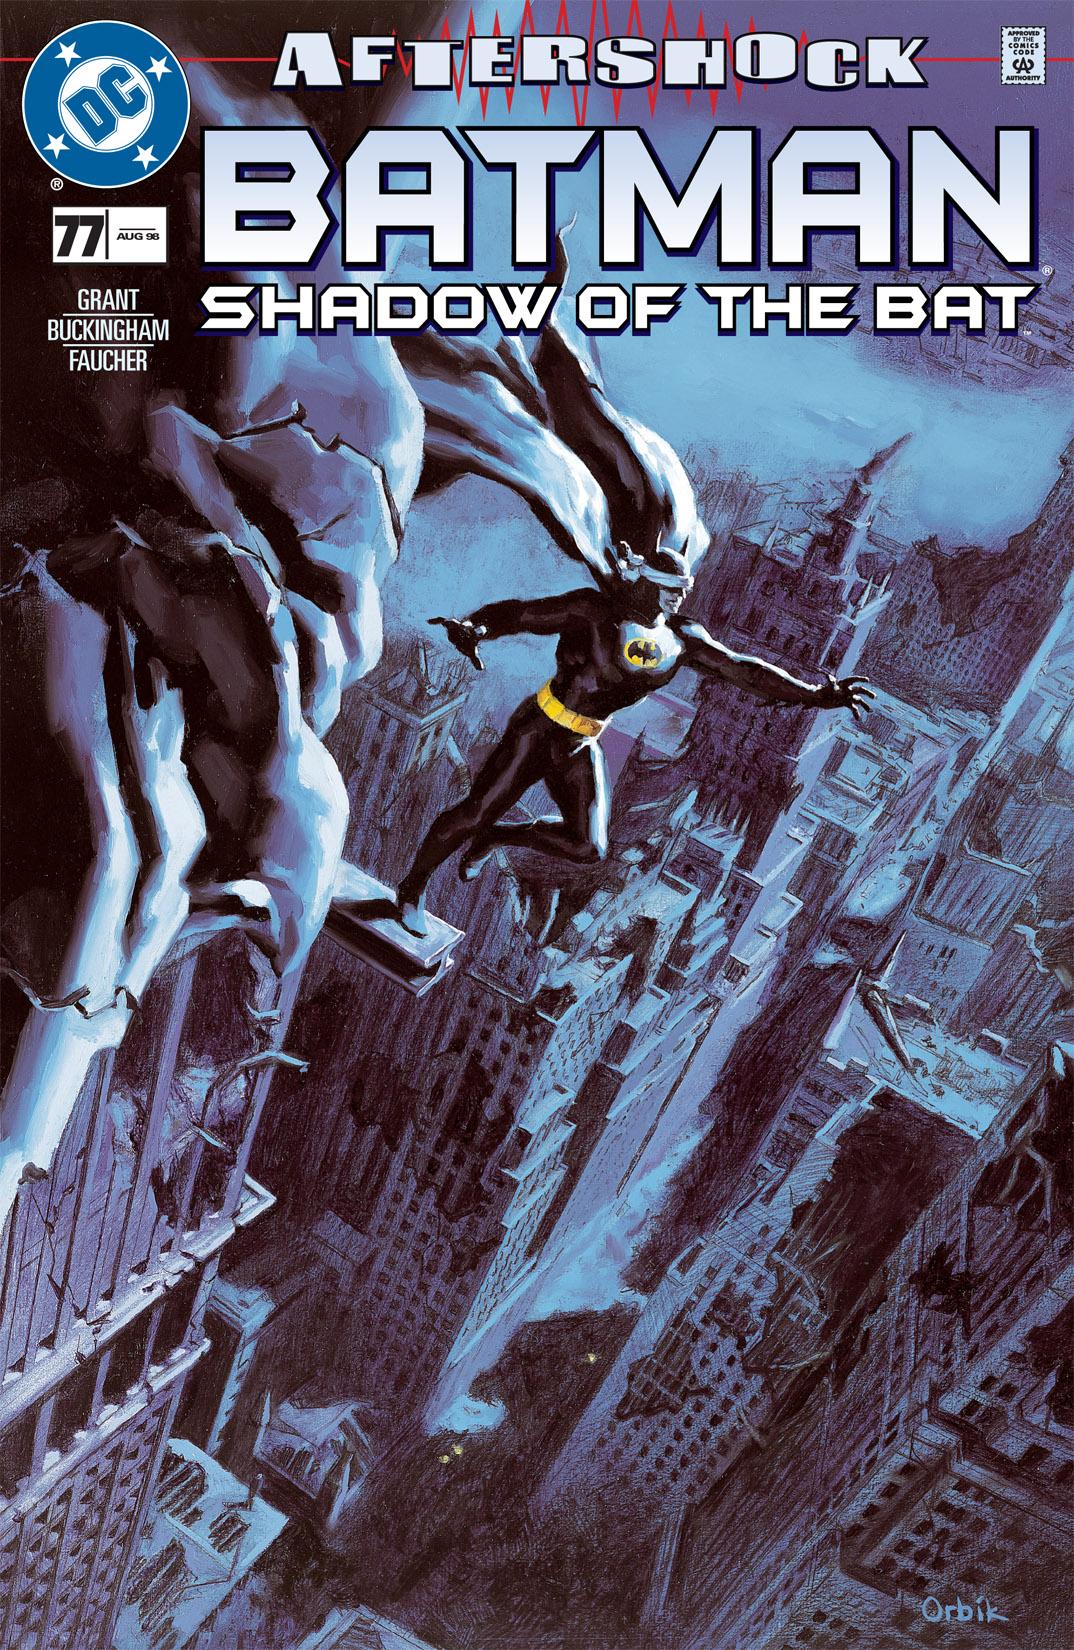 Batman: Shadow of the Bat 77 Page 1